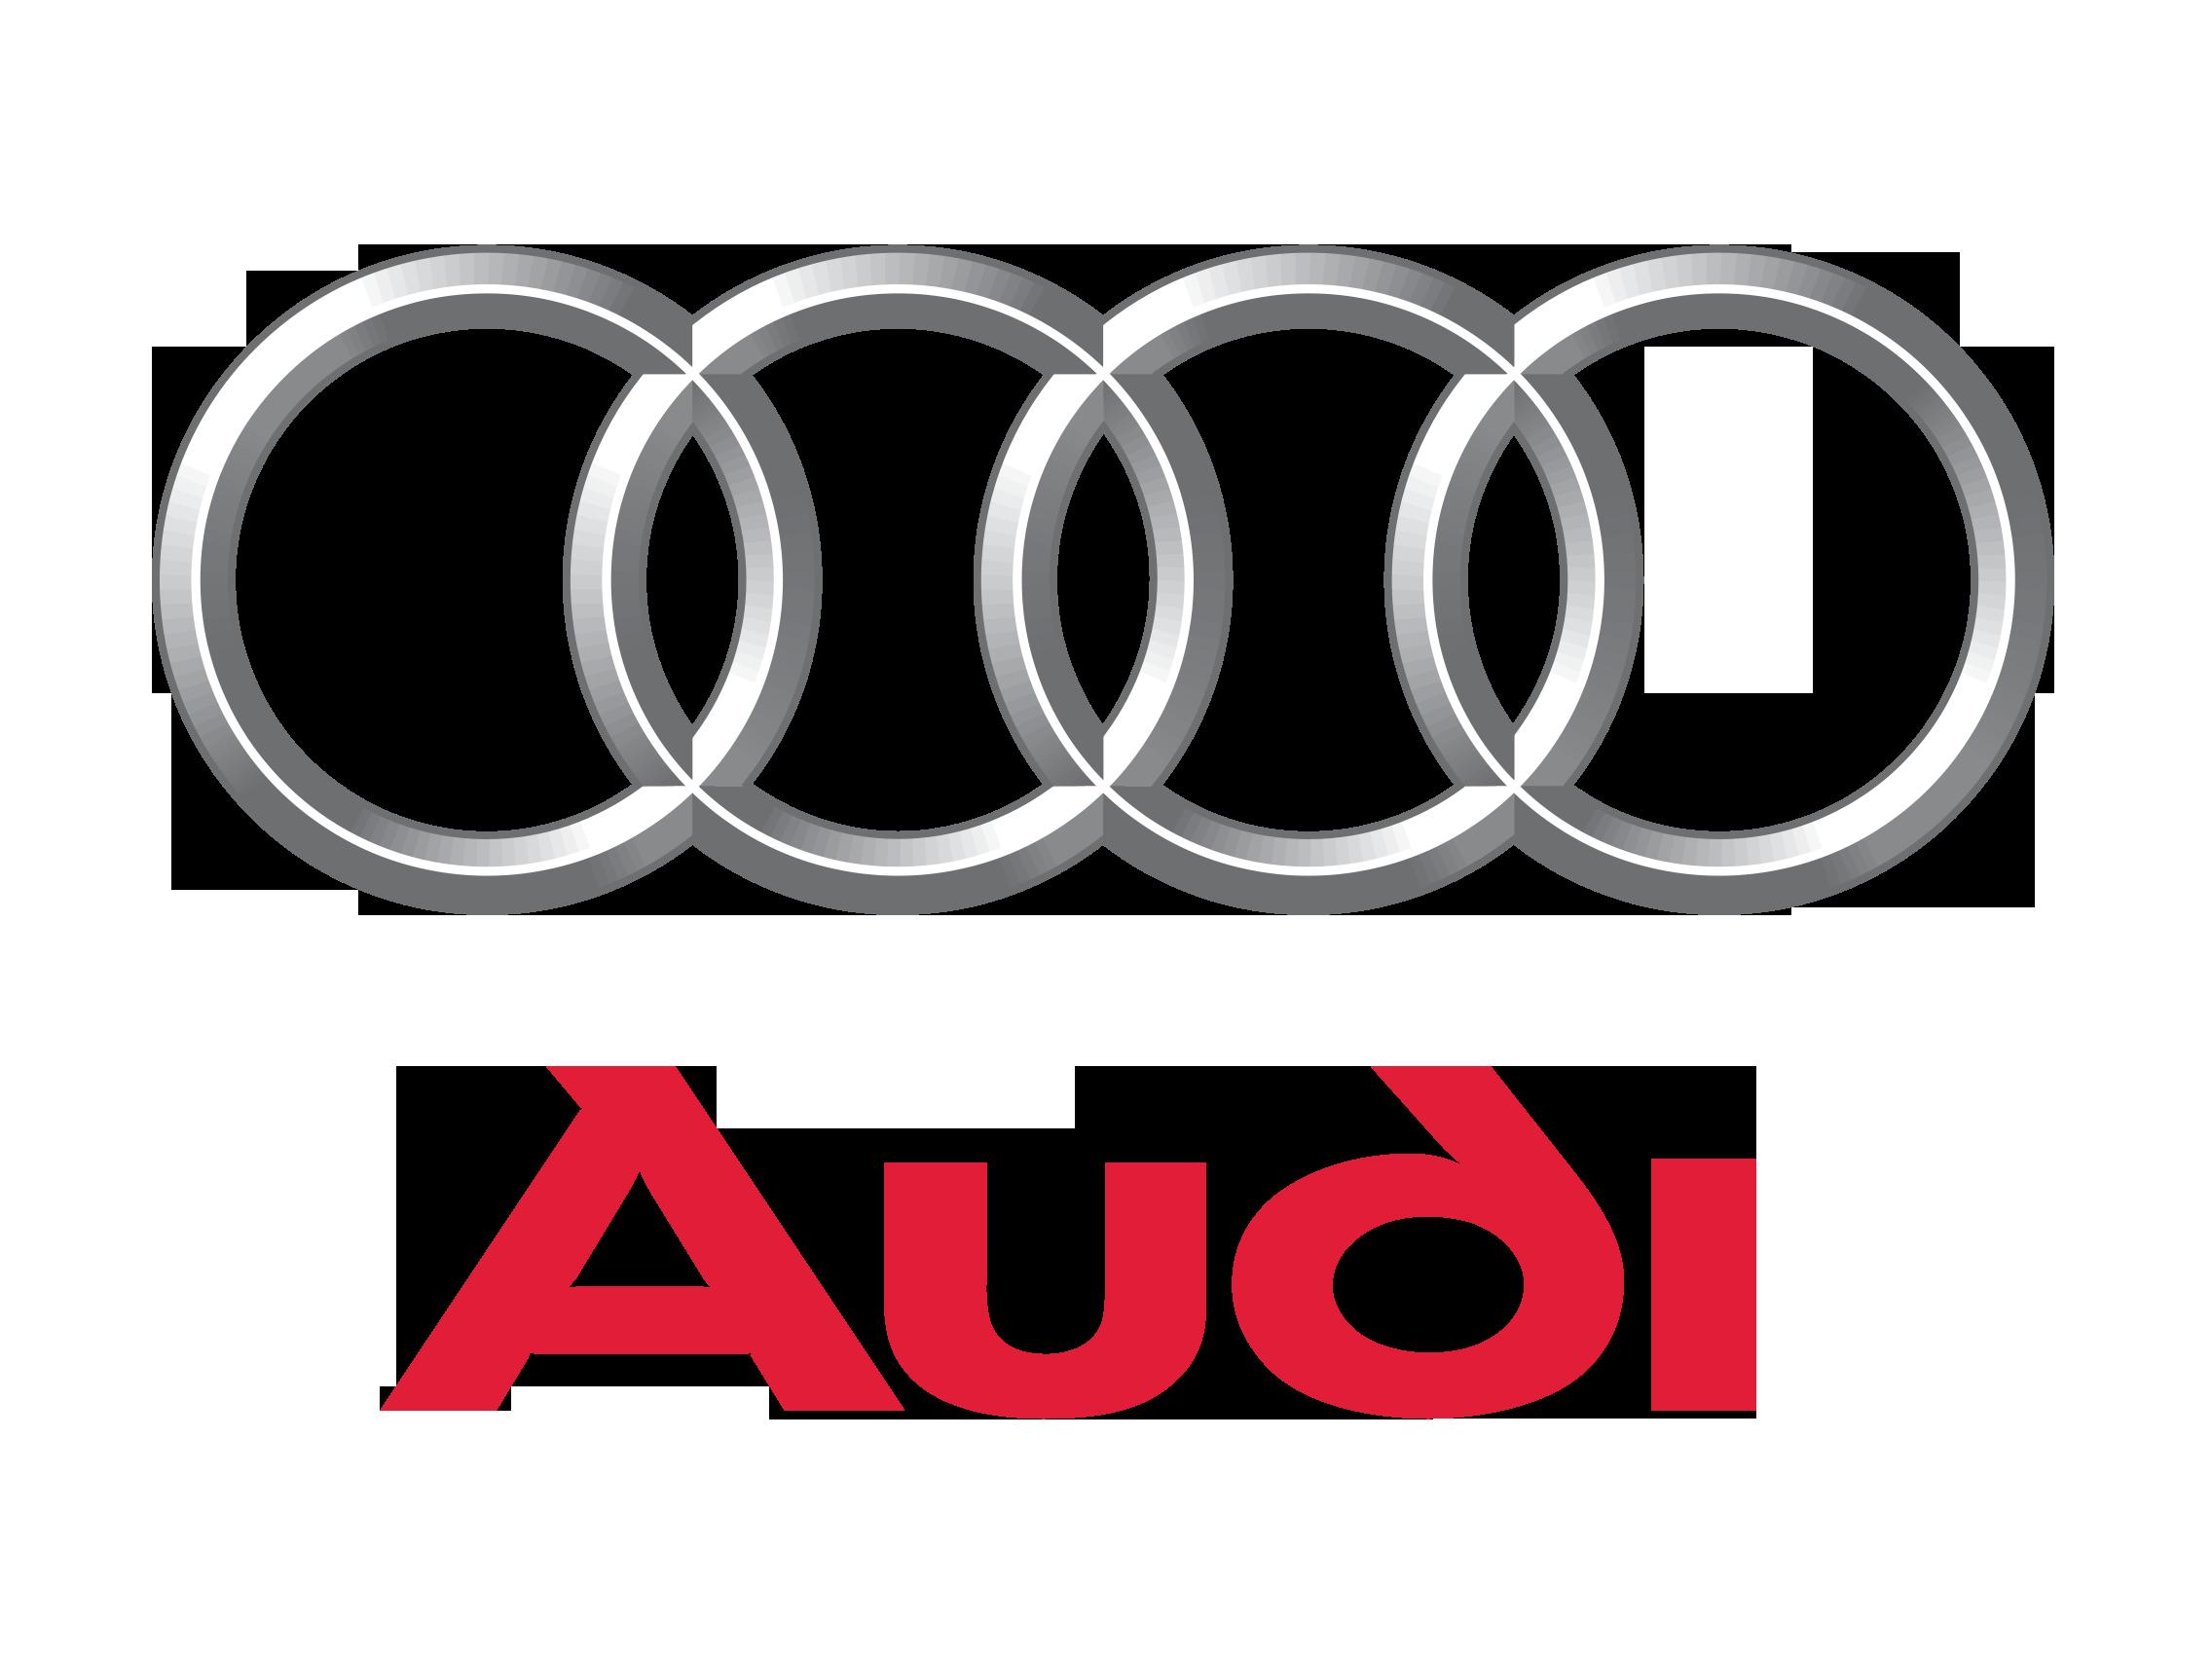 Audi Photo Booth